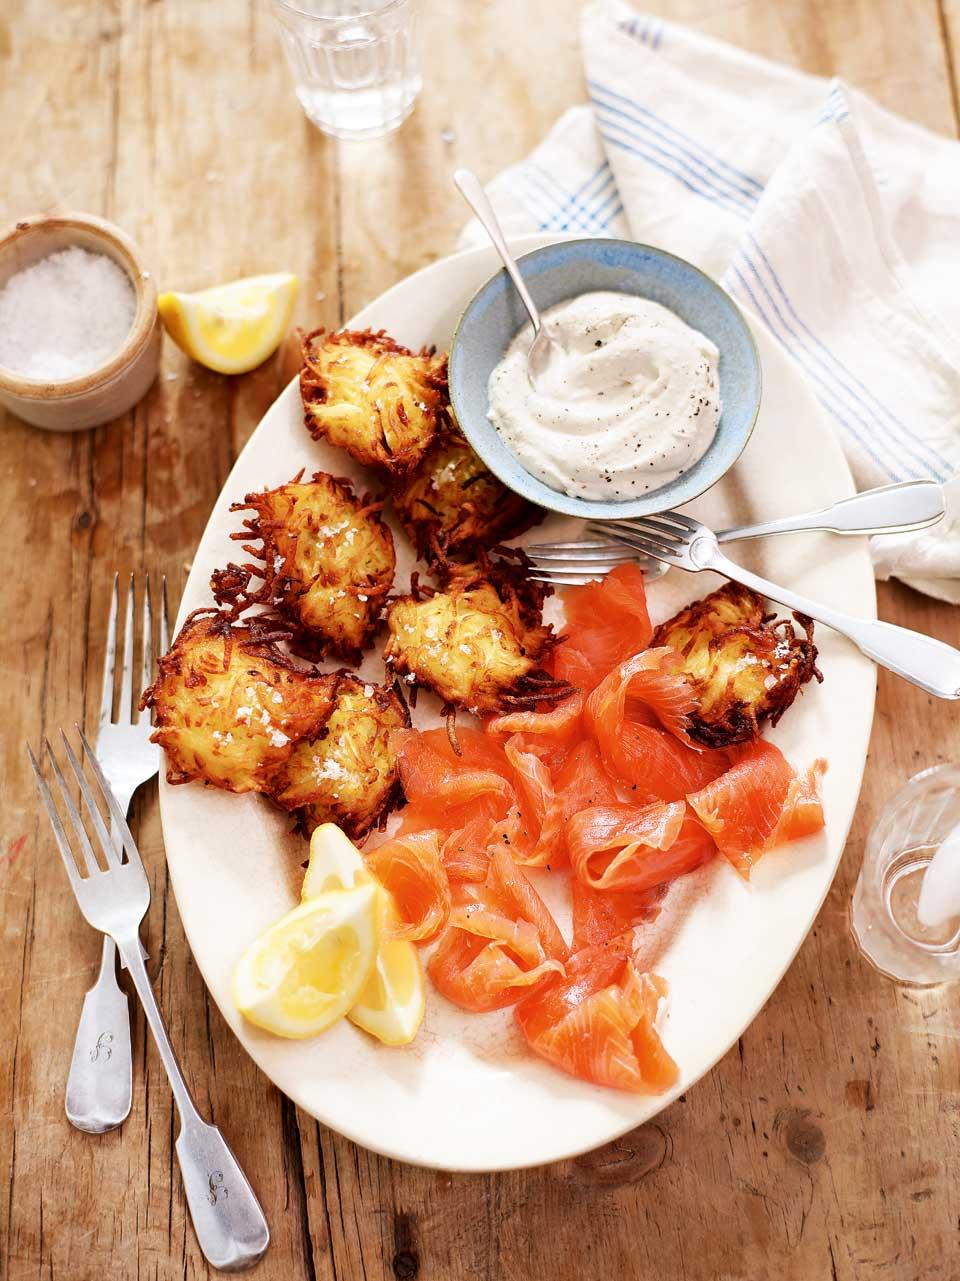 Potato latkes with smoked salmon and horseradish crme frache potato latkes with smoked salmon and horseradish crme frache delicious magazine forumfinder Gallery